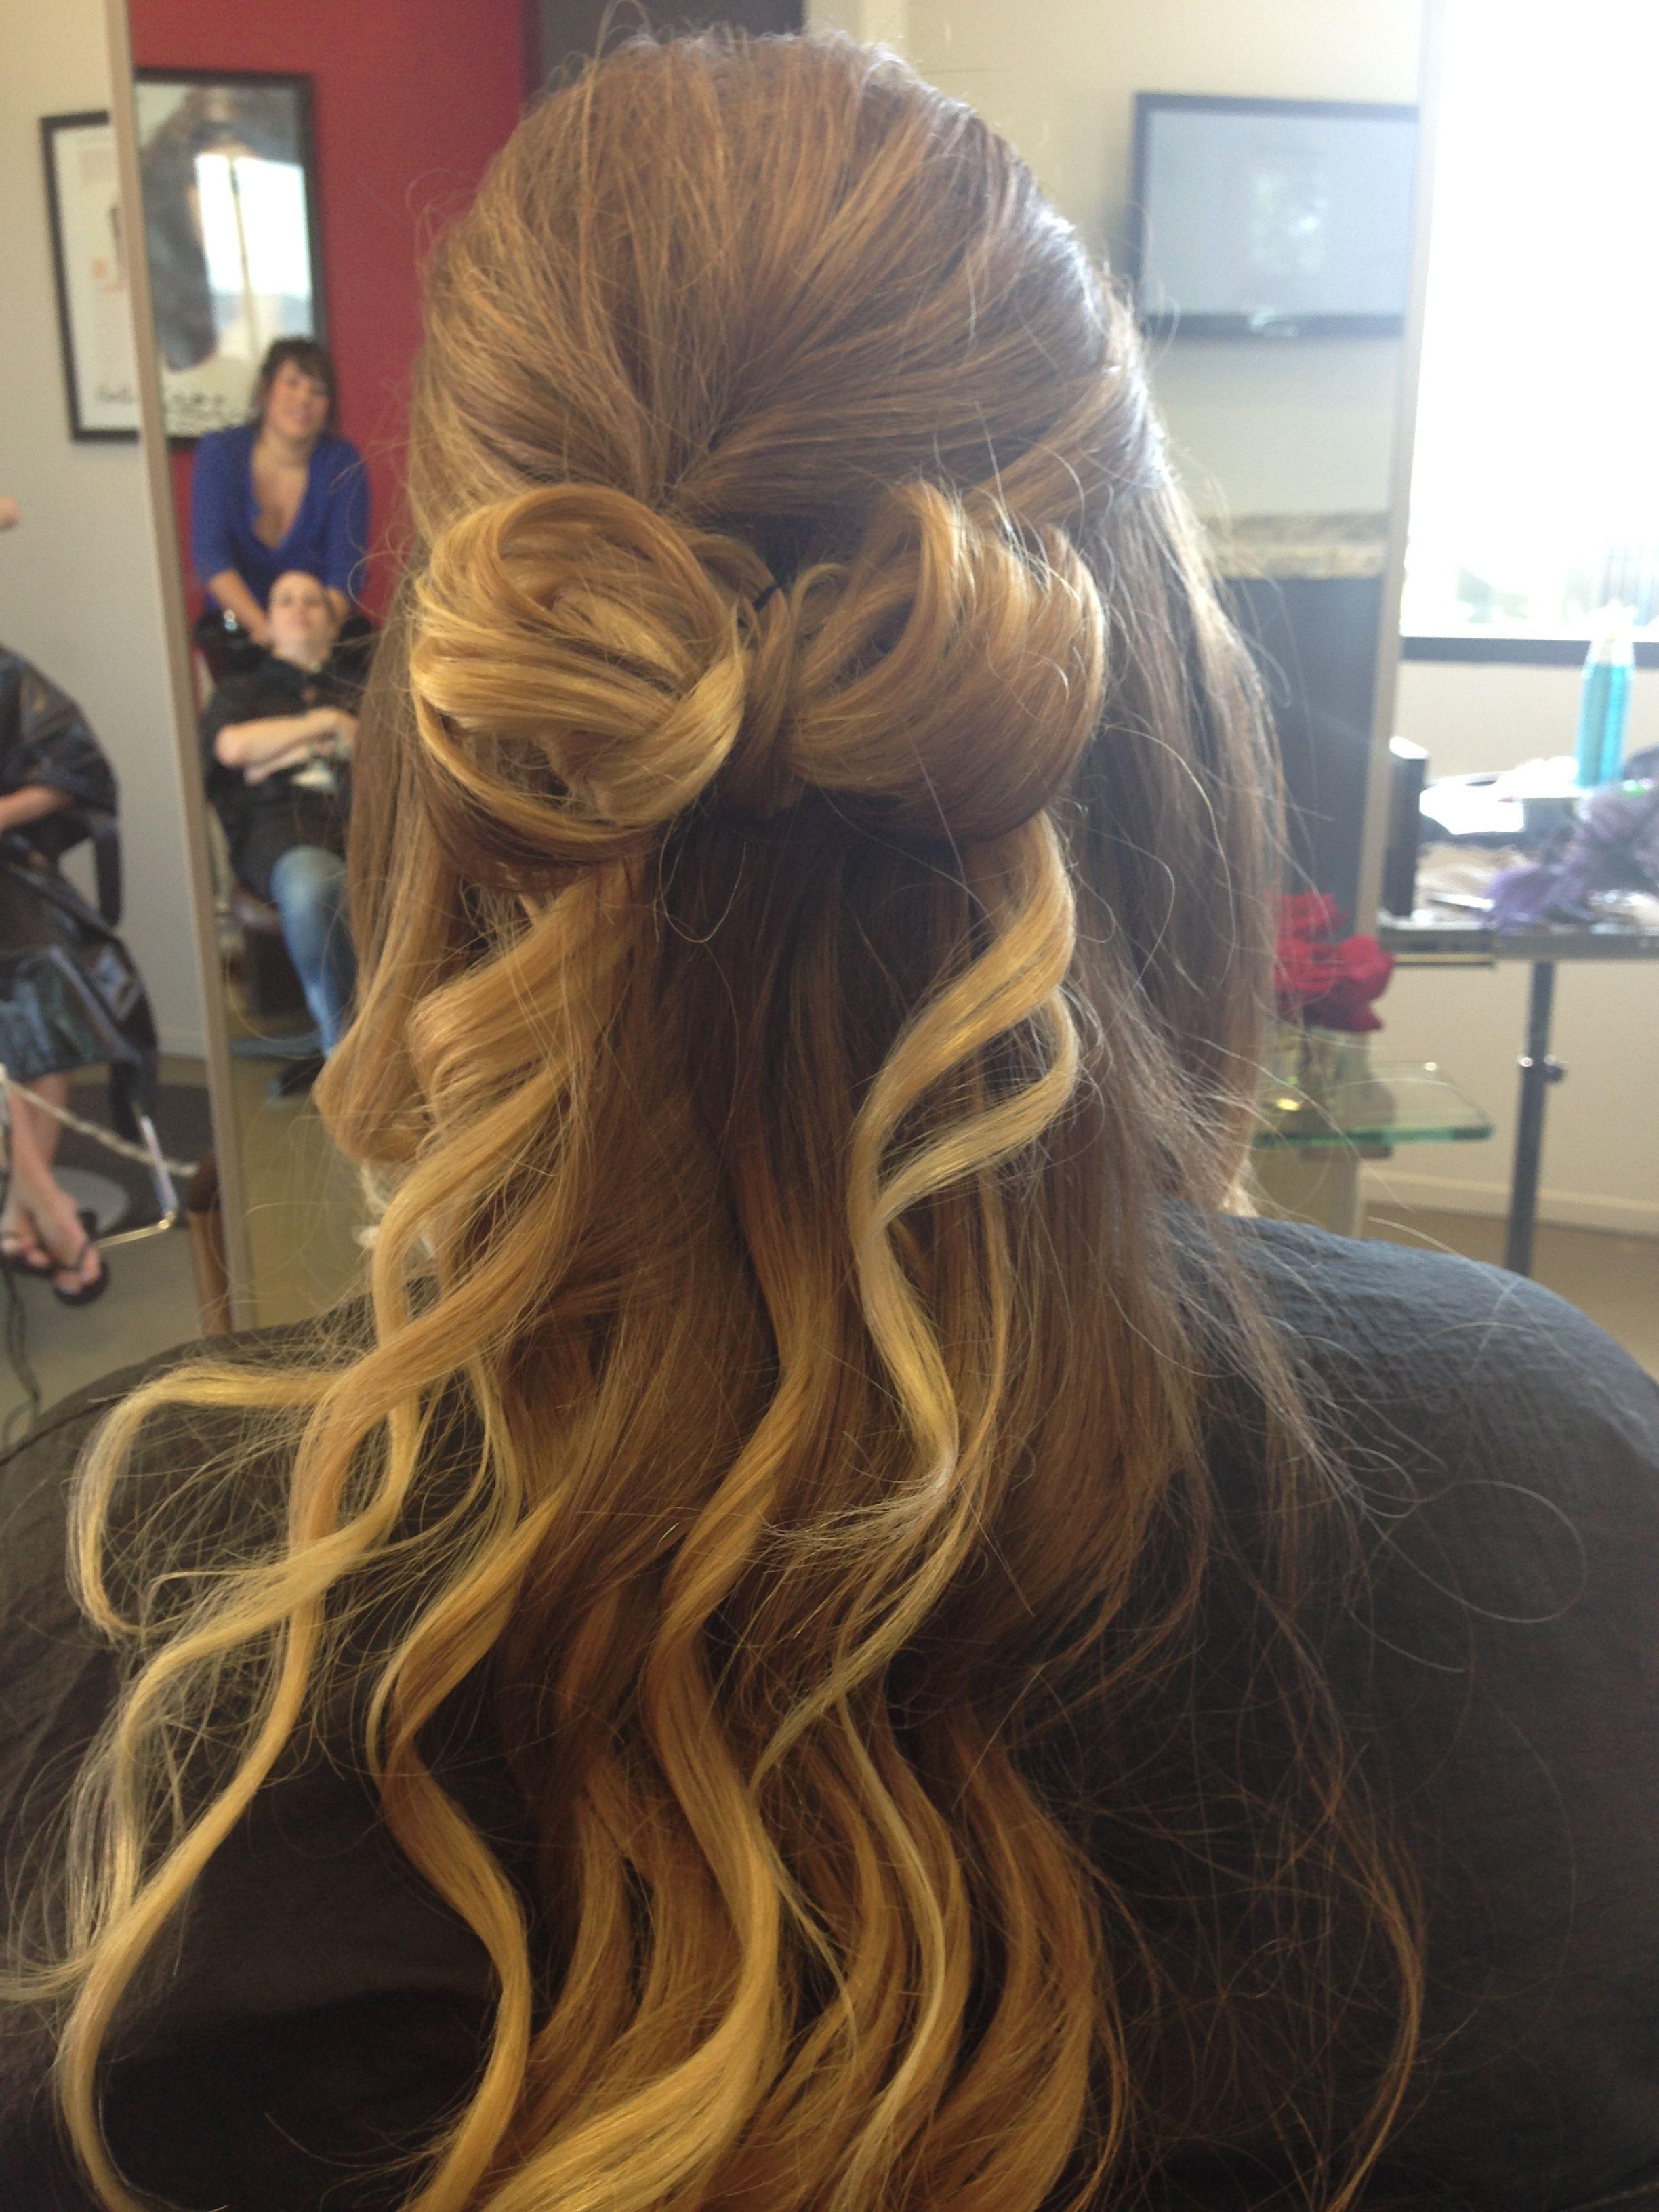 #prom #hair bow